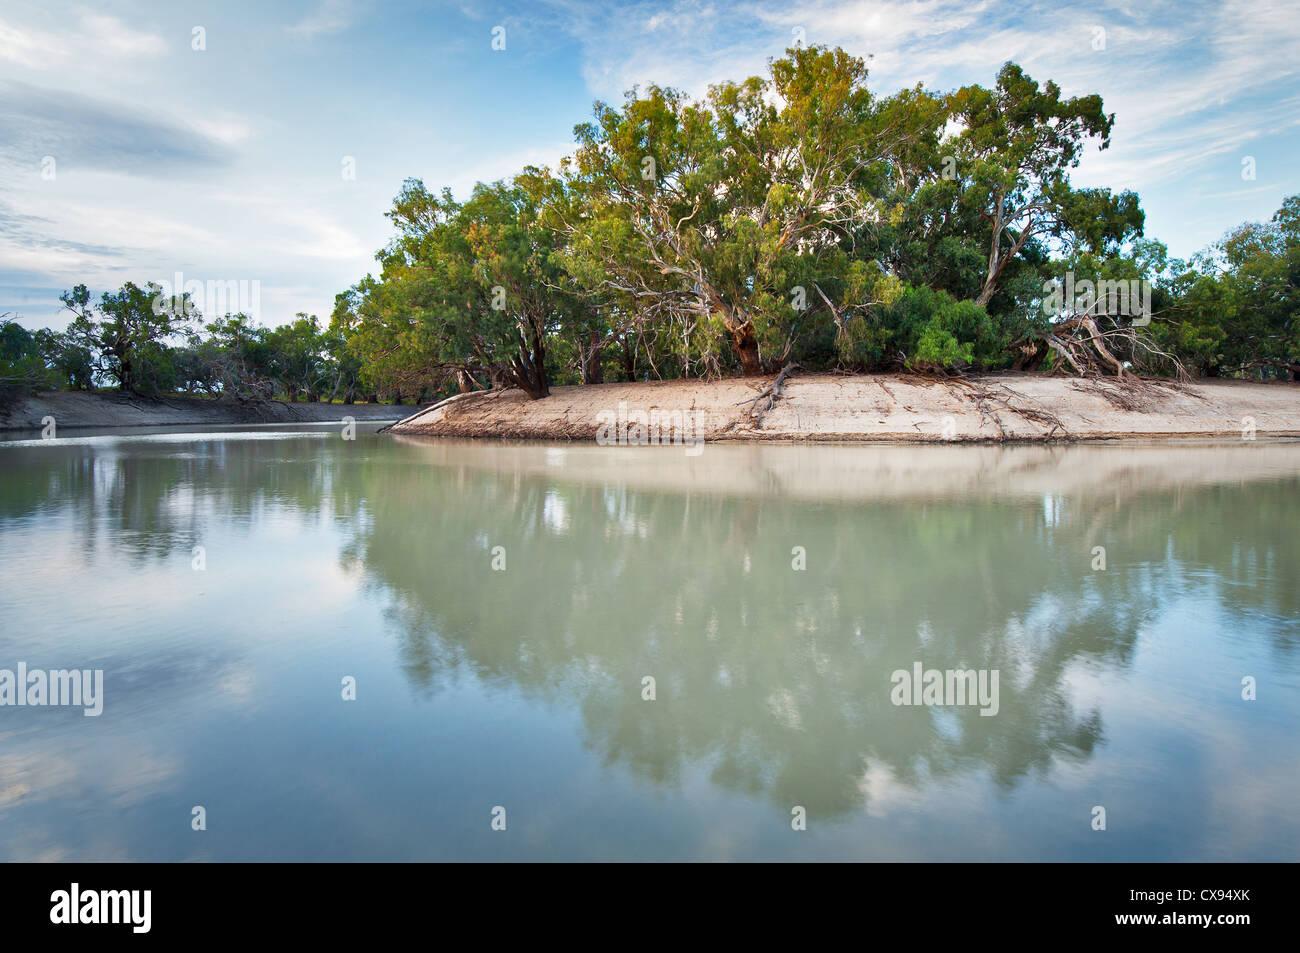 Big Bend at Darling River in Kinchega National Park. - Stock Image